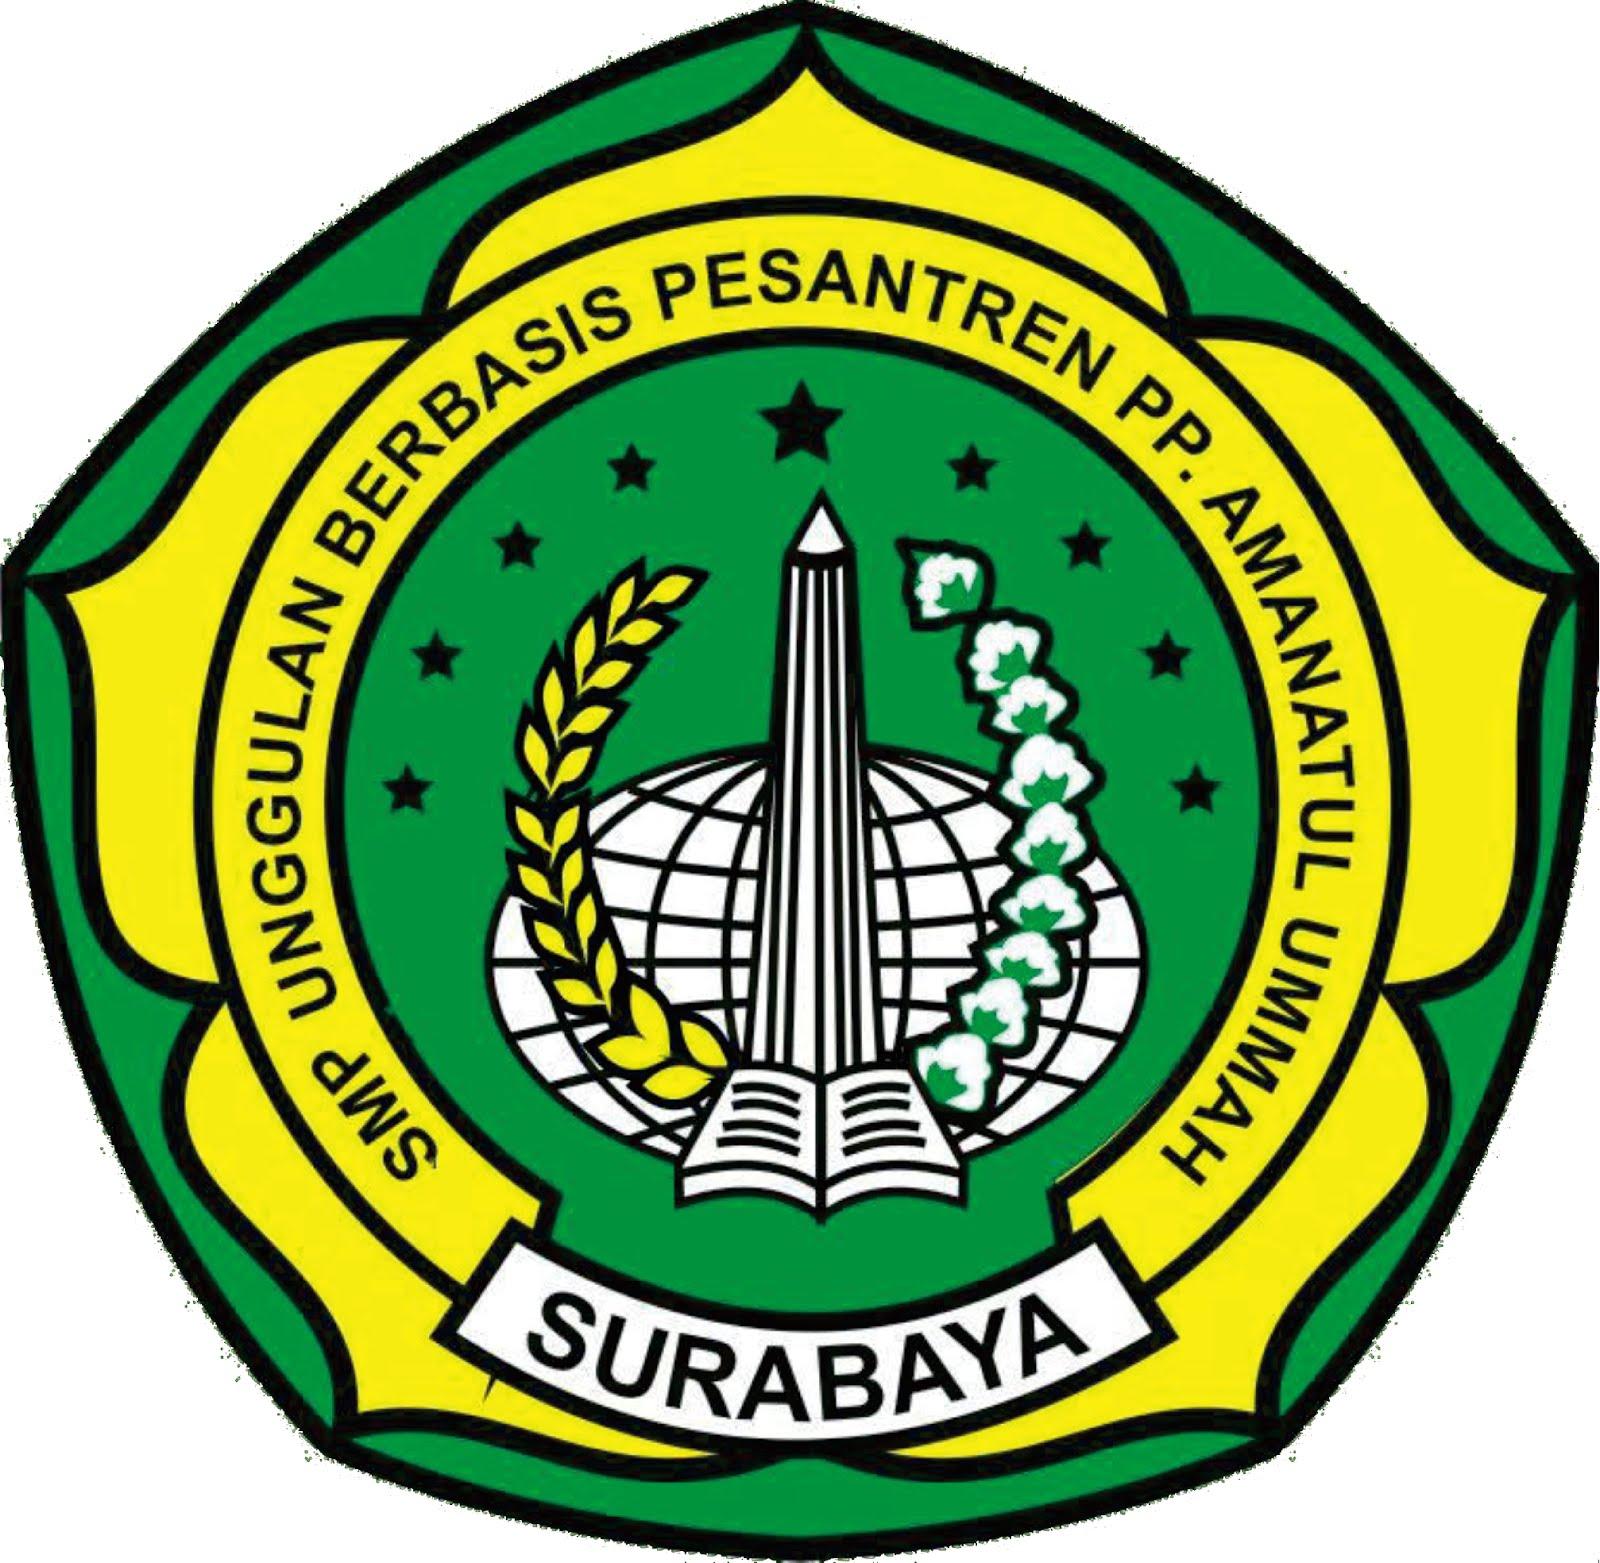 SMPU-BP Amanatul Ummah